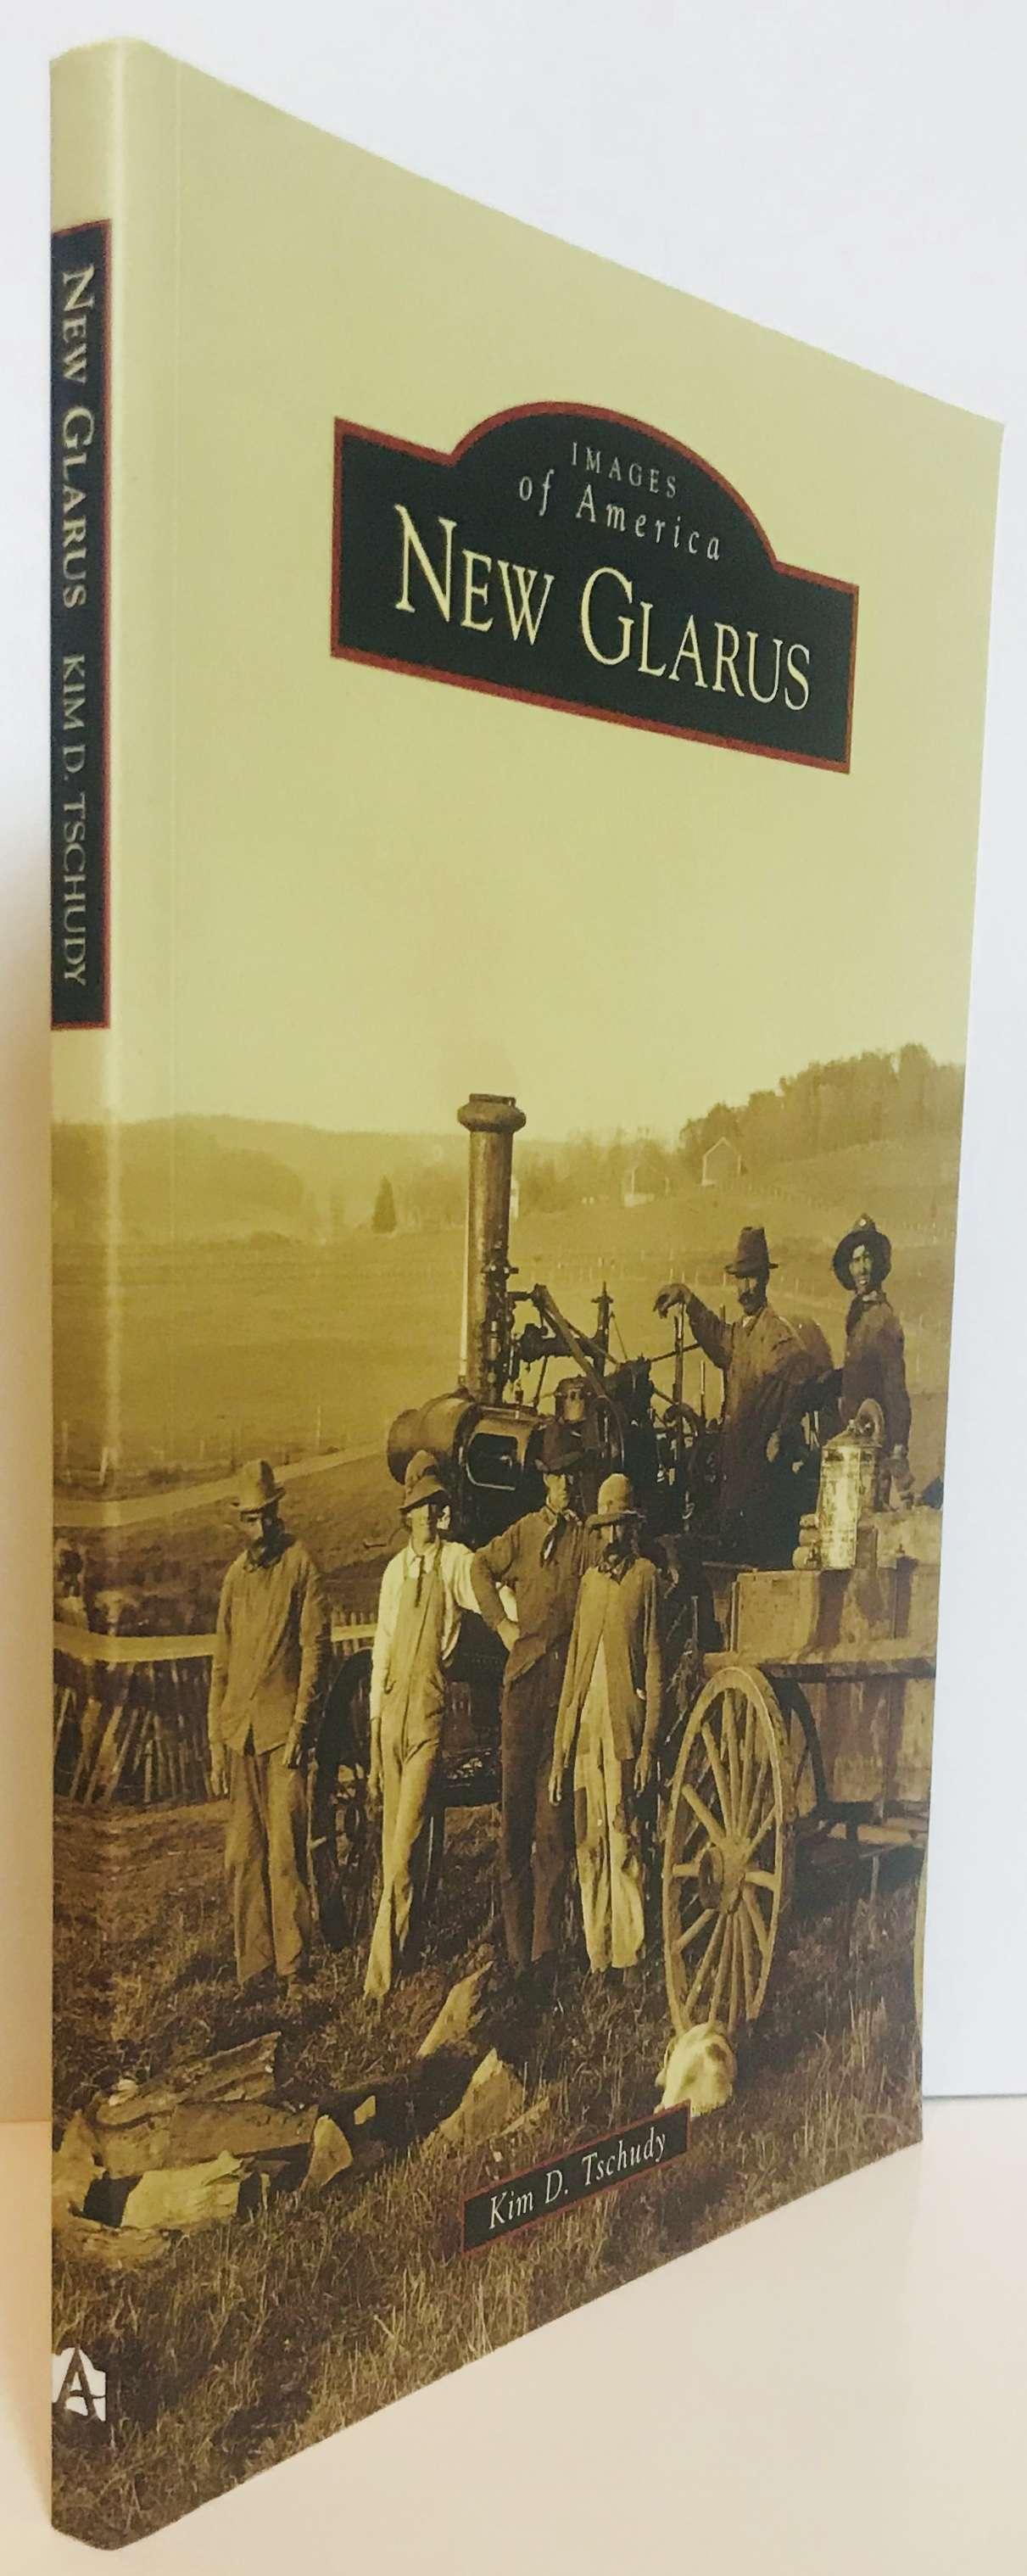 New Glarus (Images of America), Tschudy, Kim D.